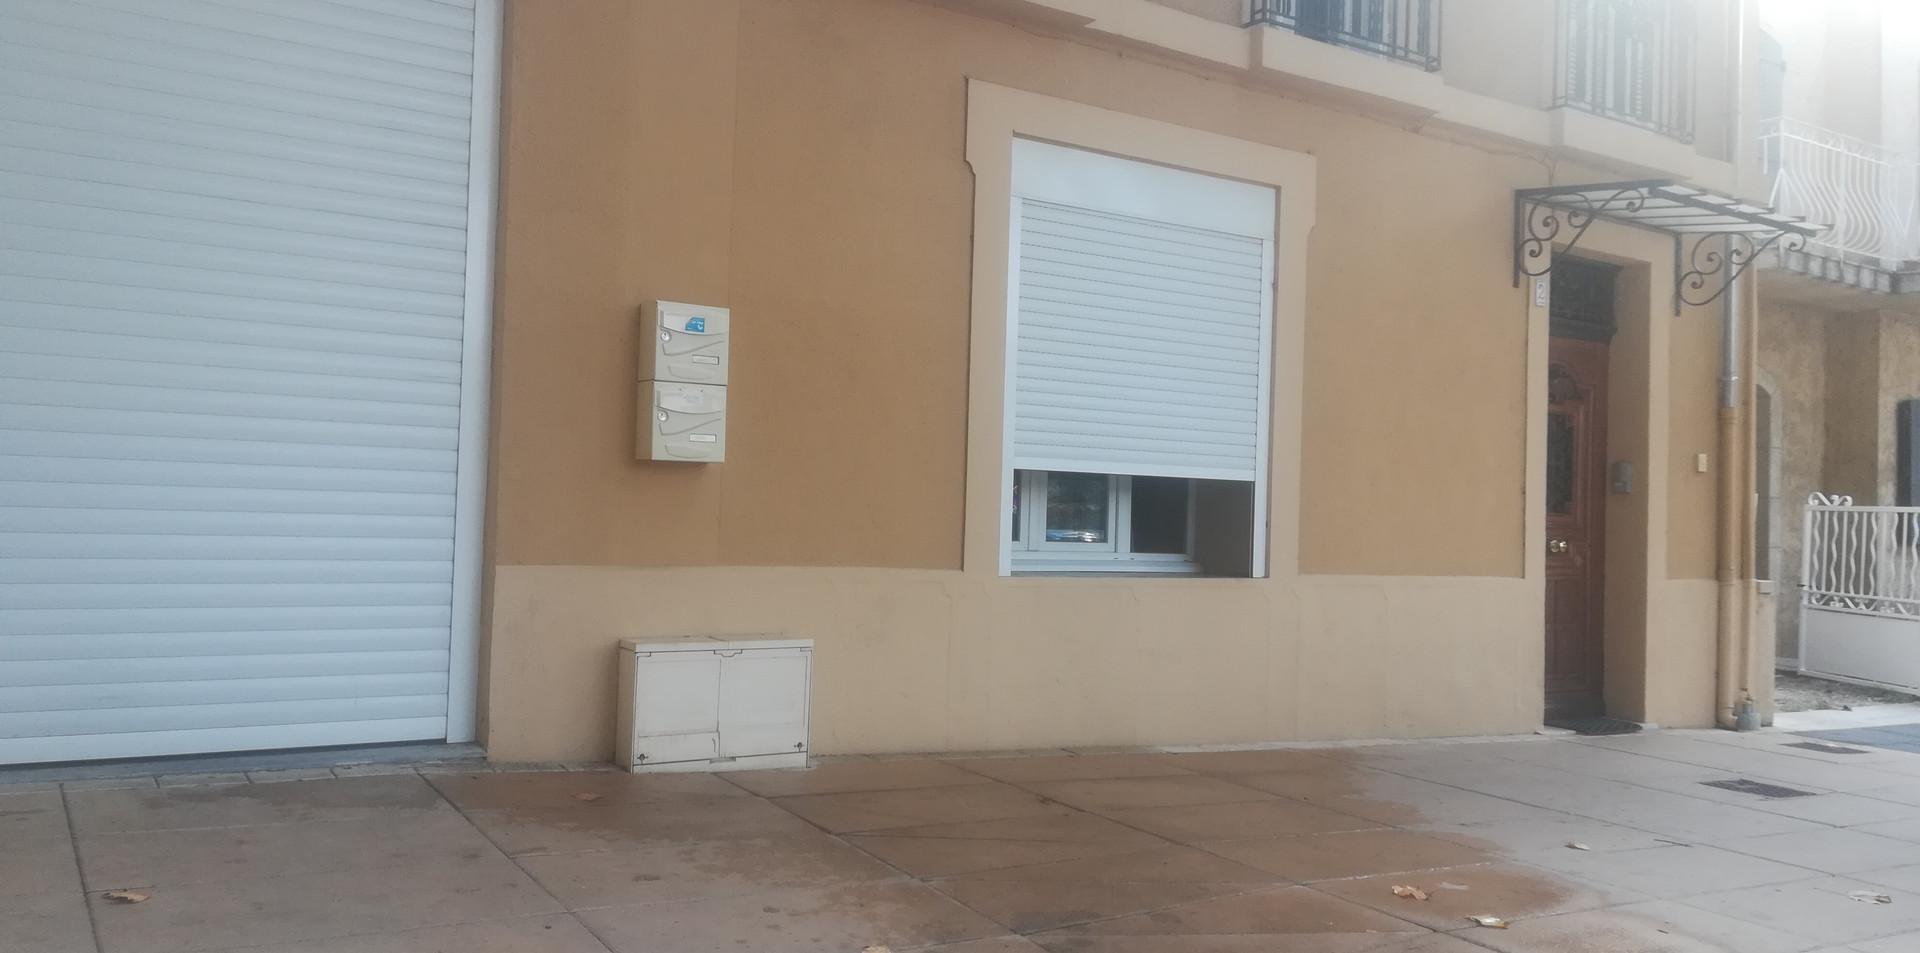 Porte de Garage Monobloc